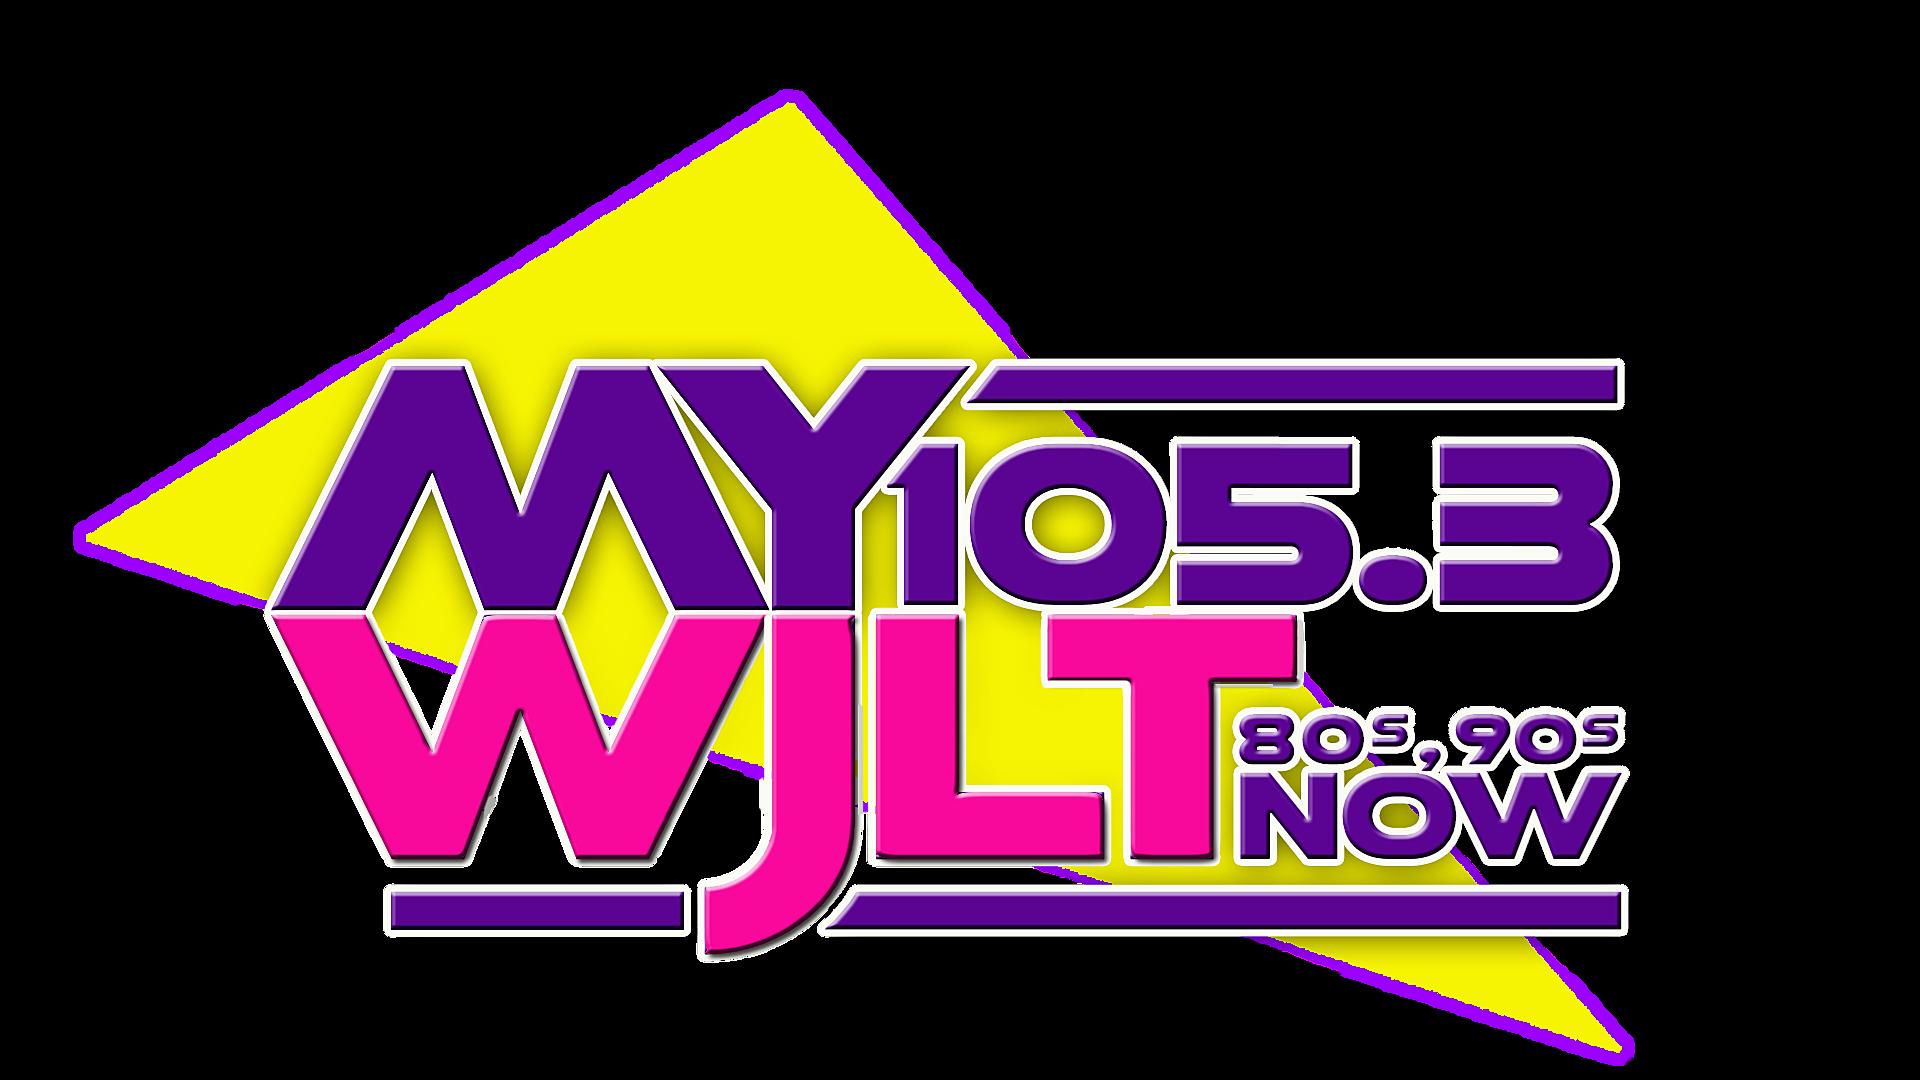 WJLT 80s 90s Now edit yellow